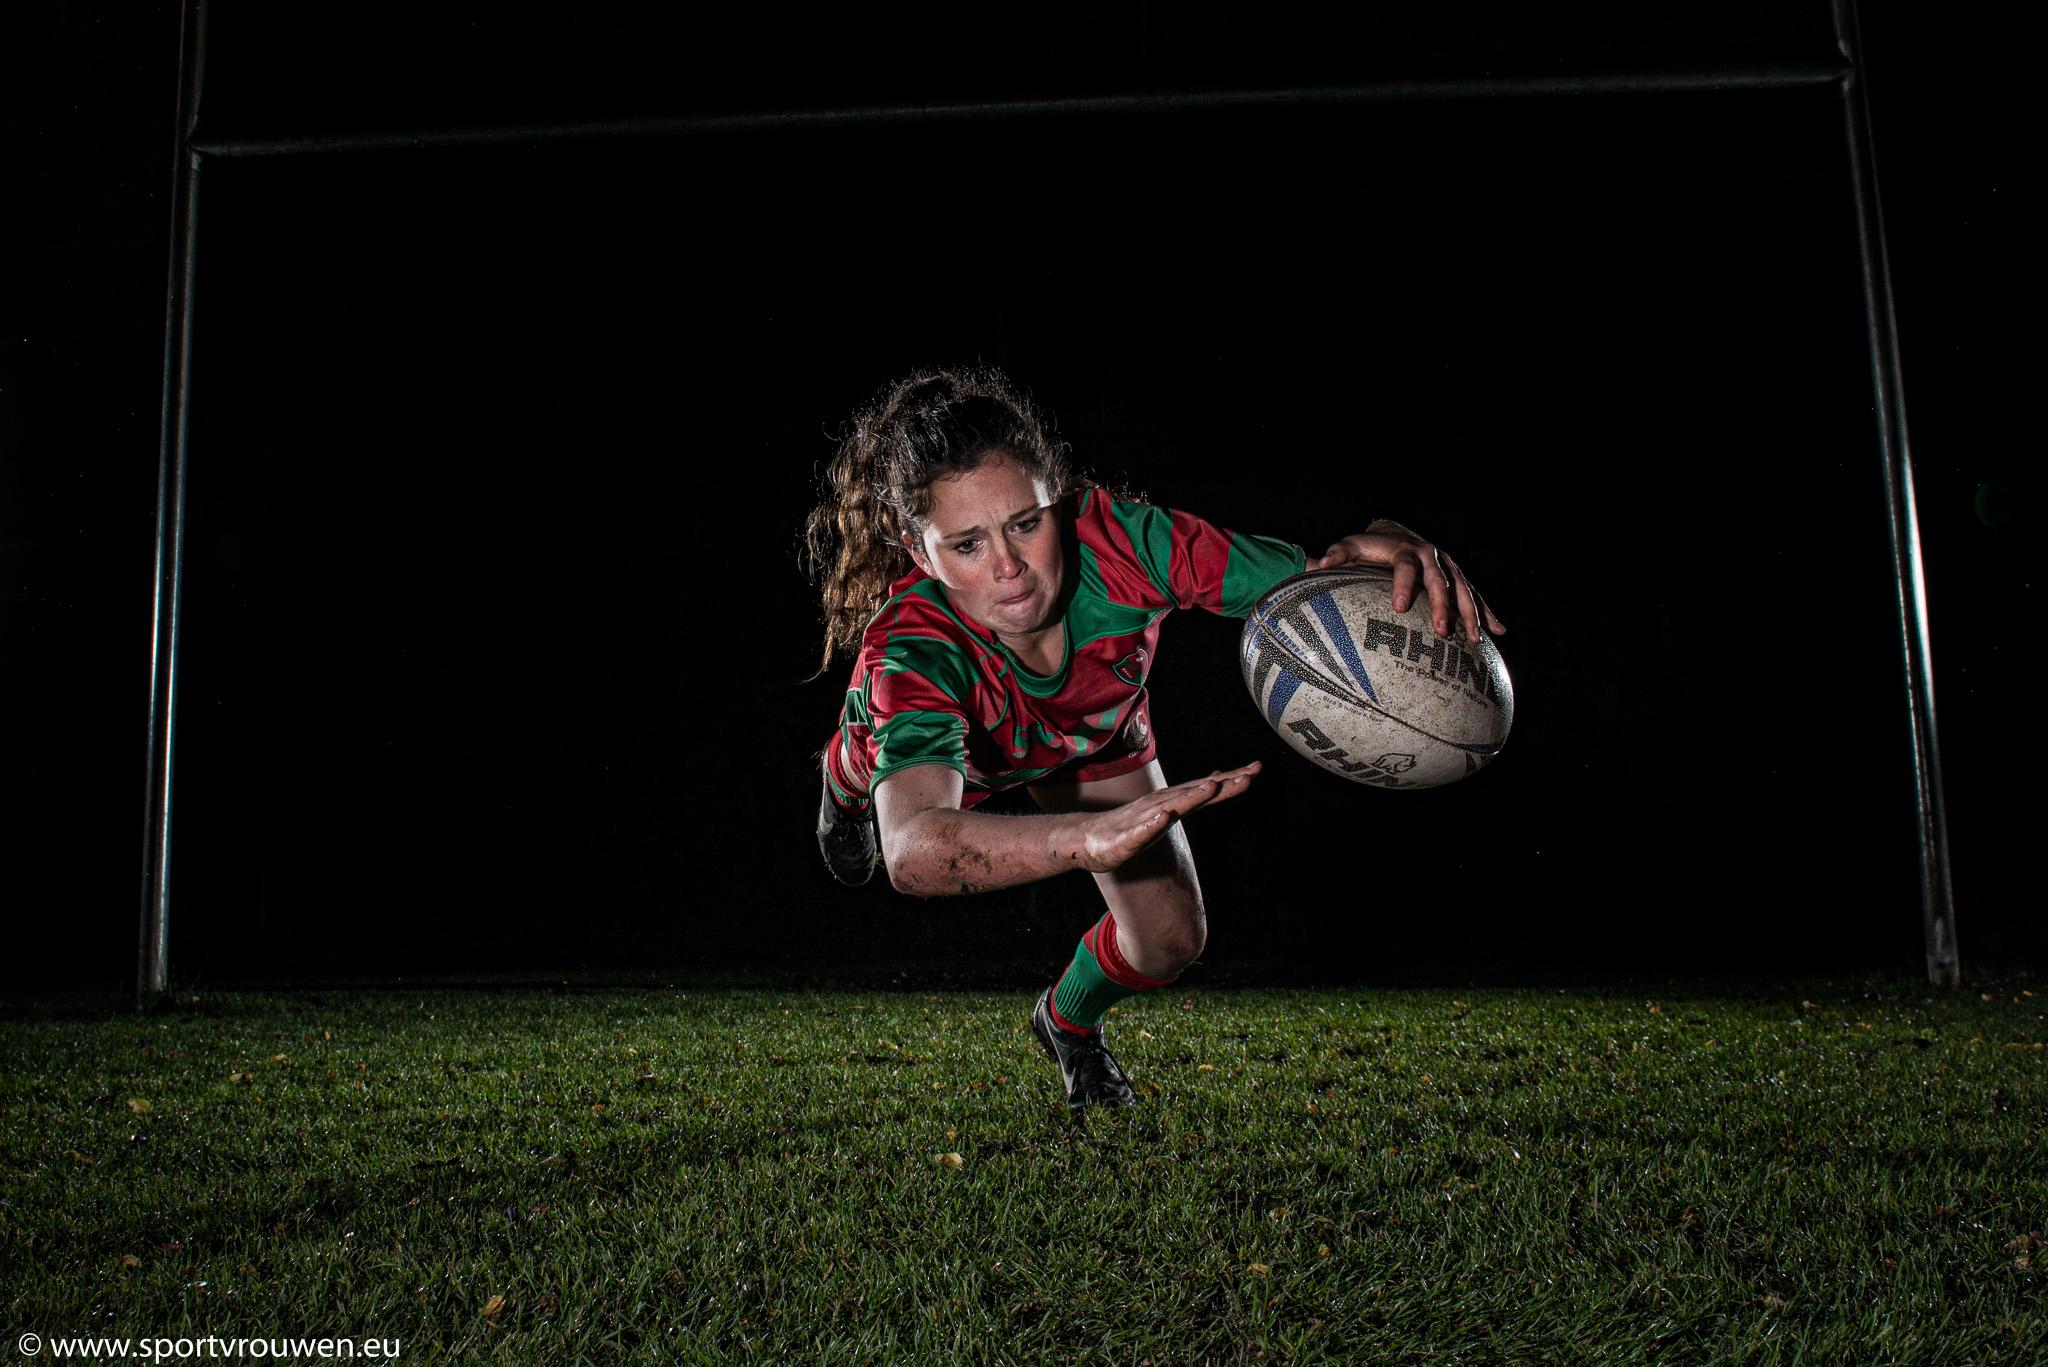 Sportvrouwen : Rugby